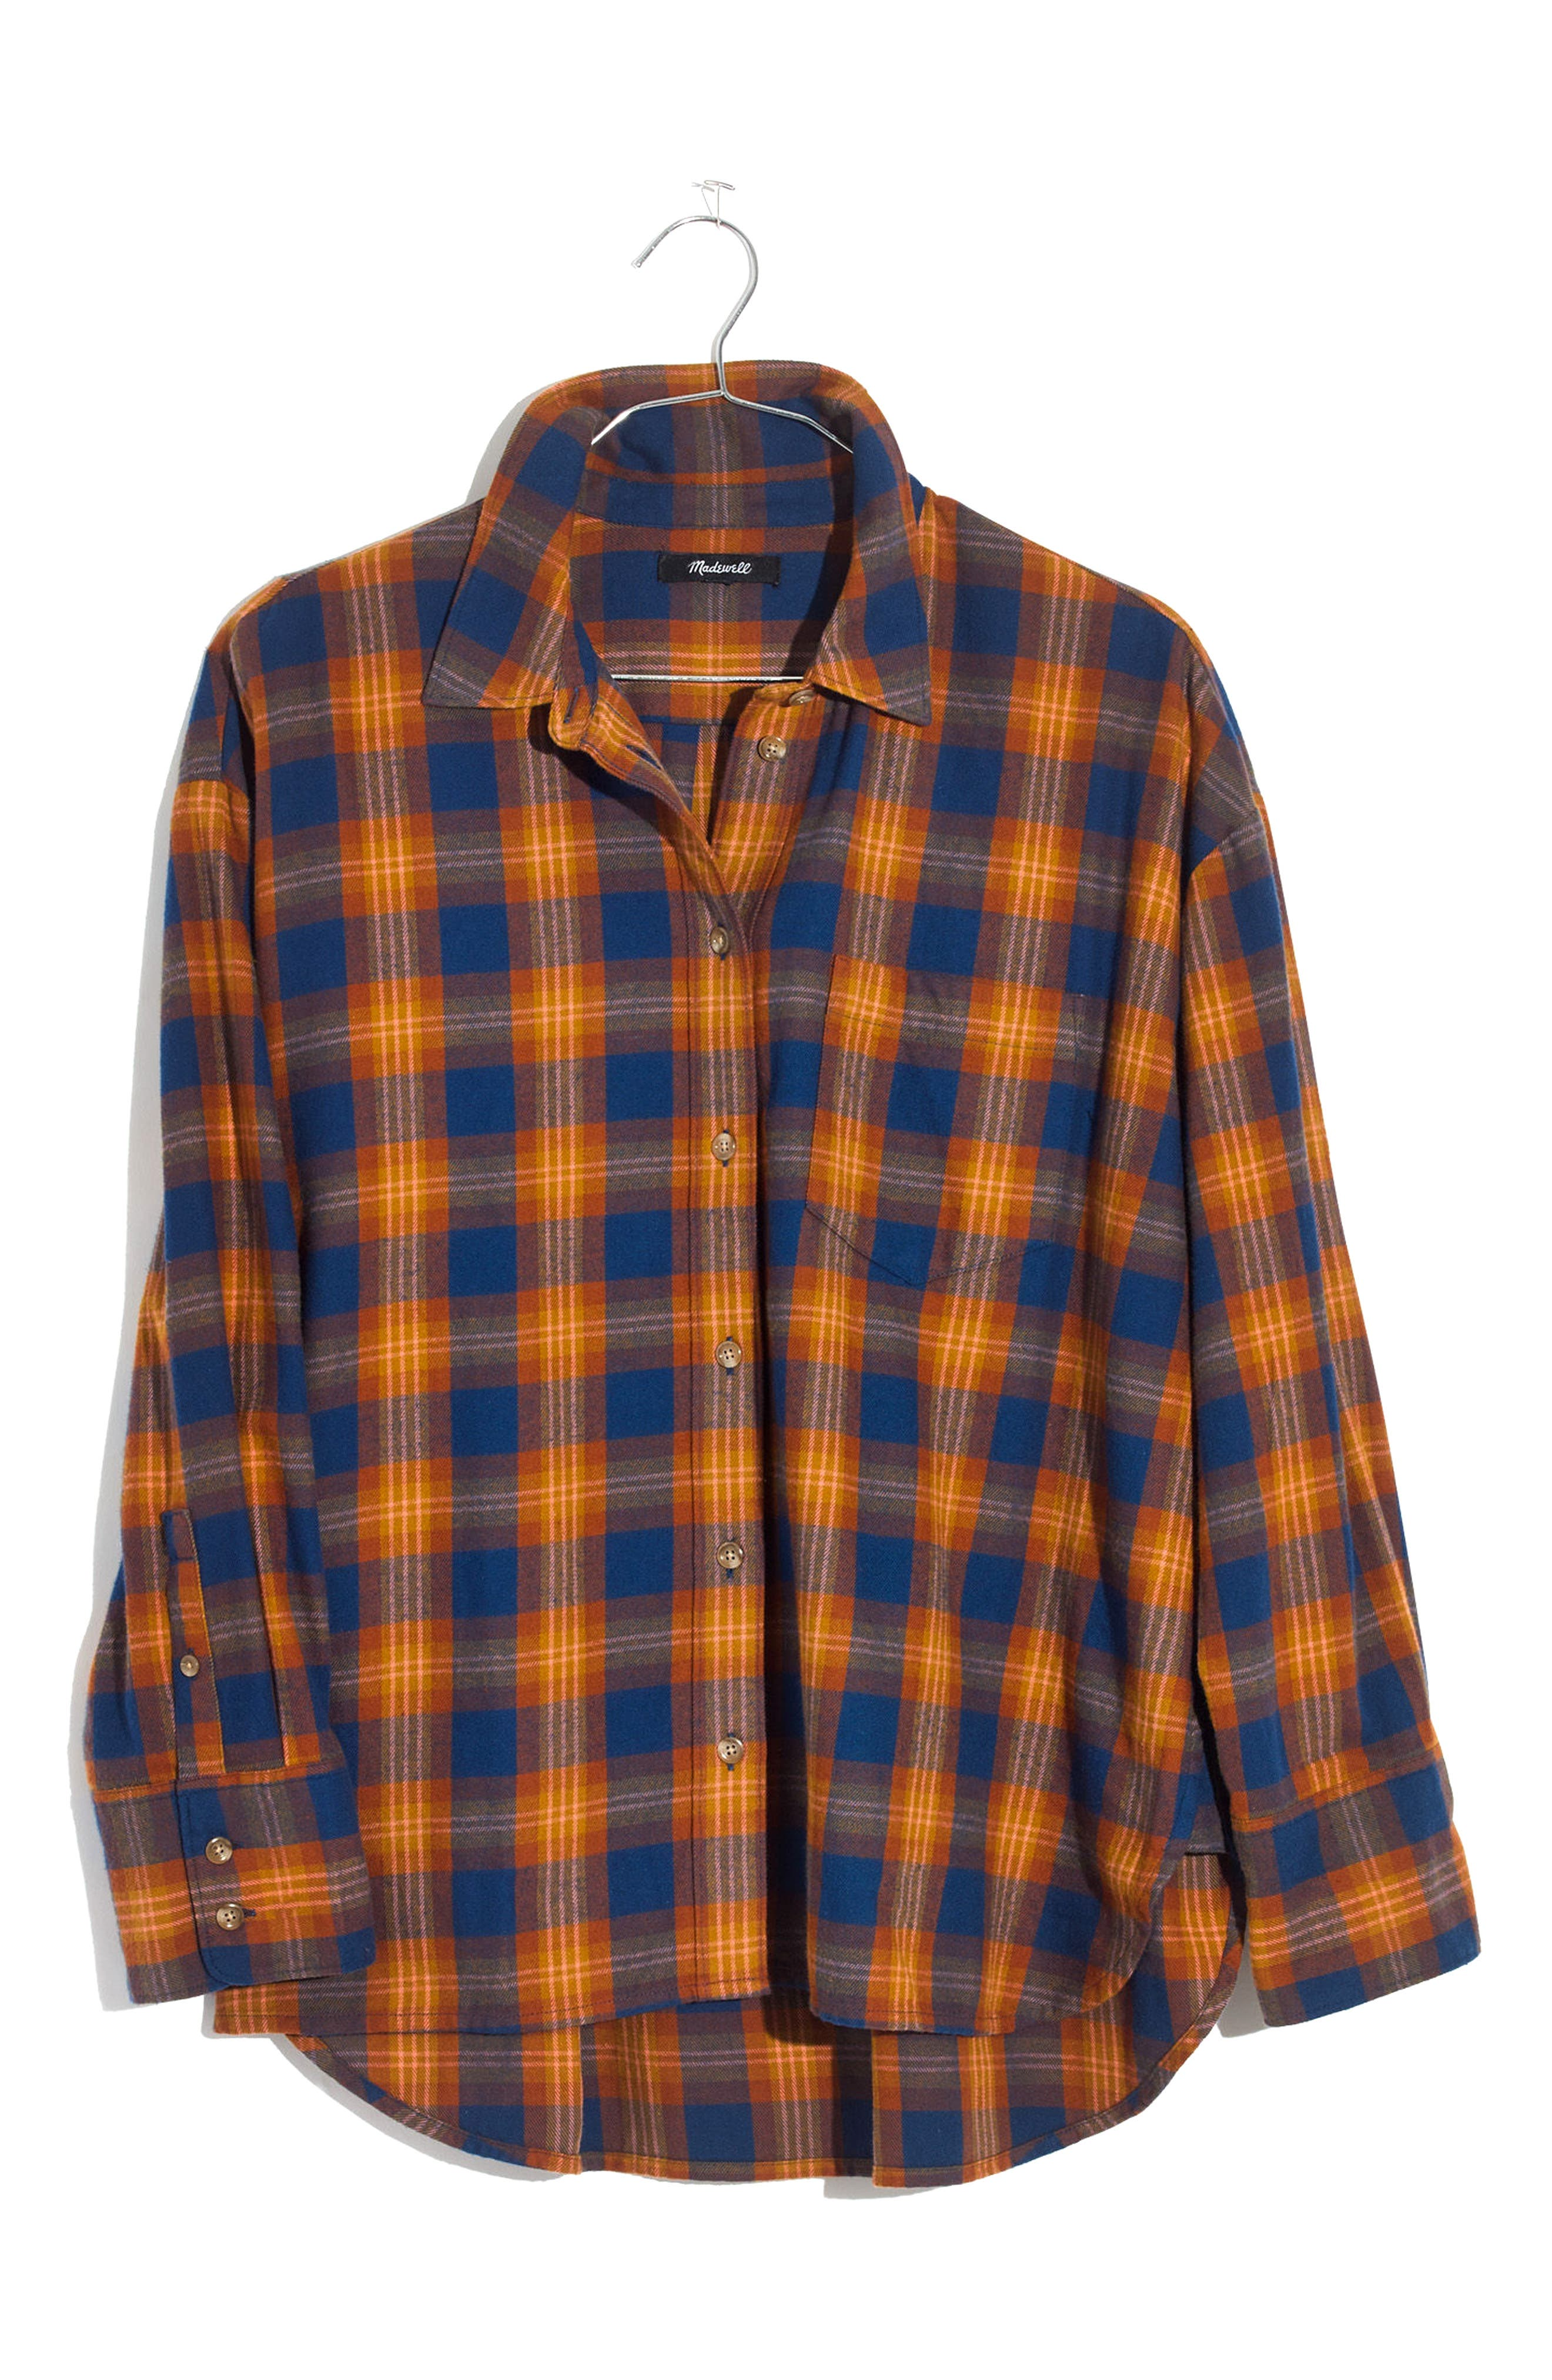 Westward Ardan Plaid Shirt,                             Alternate thumbnail 4, color,                             400